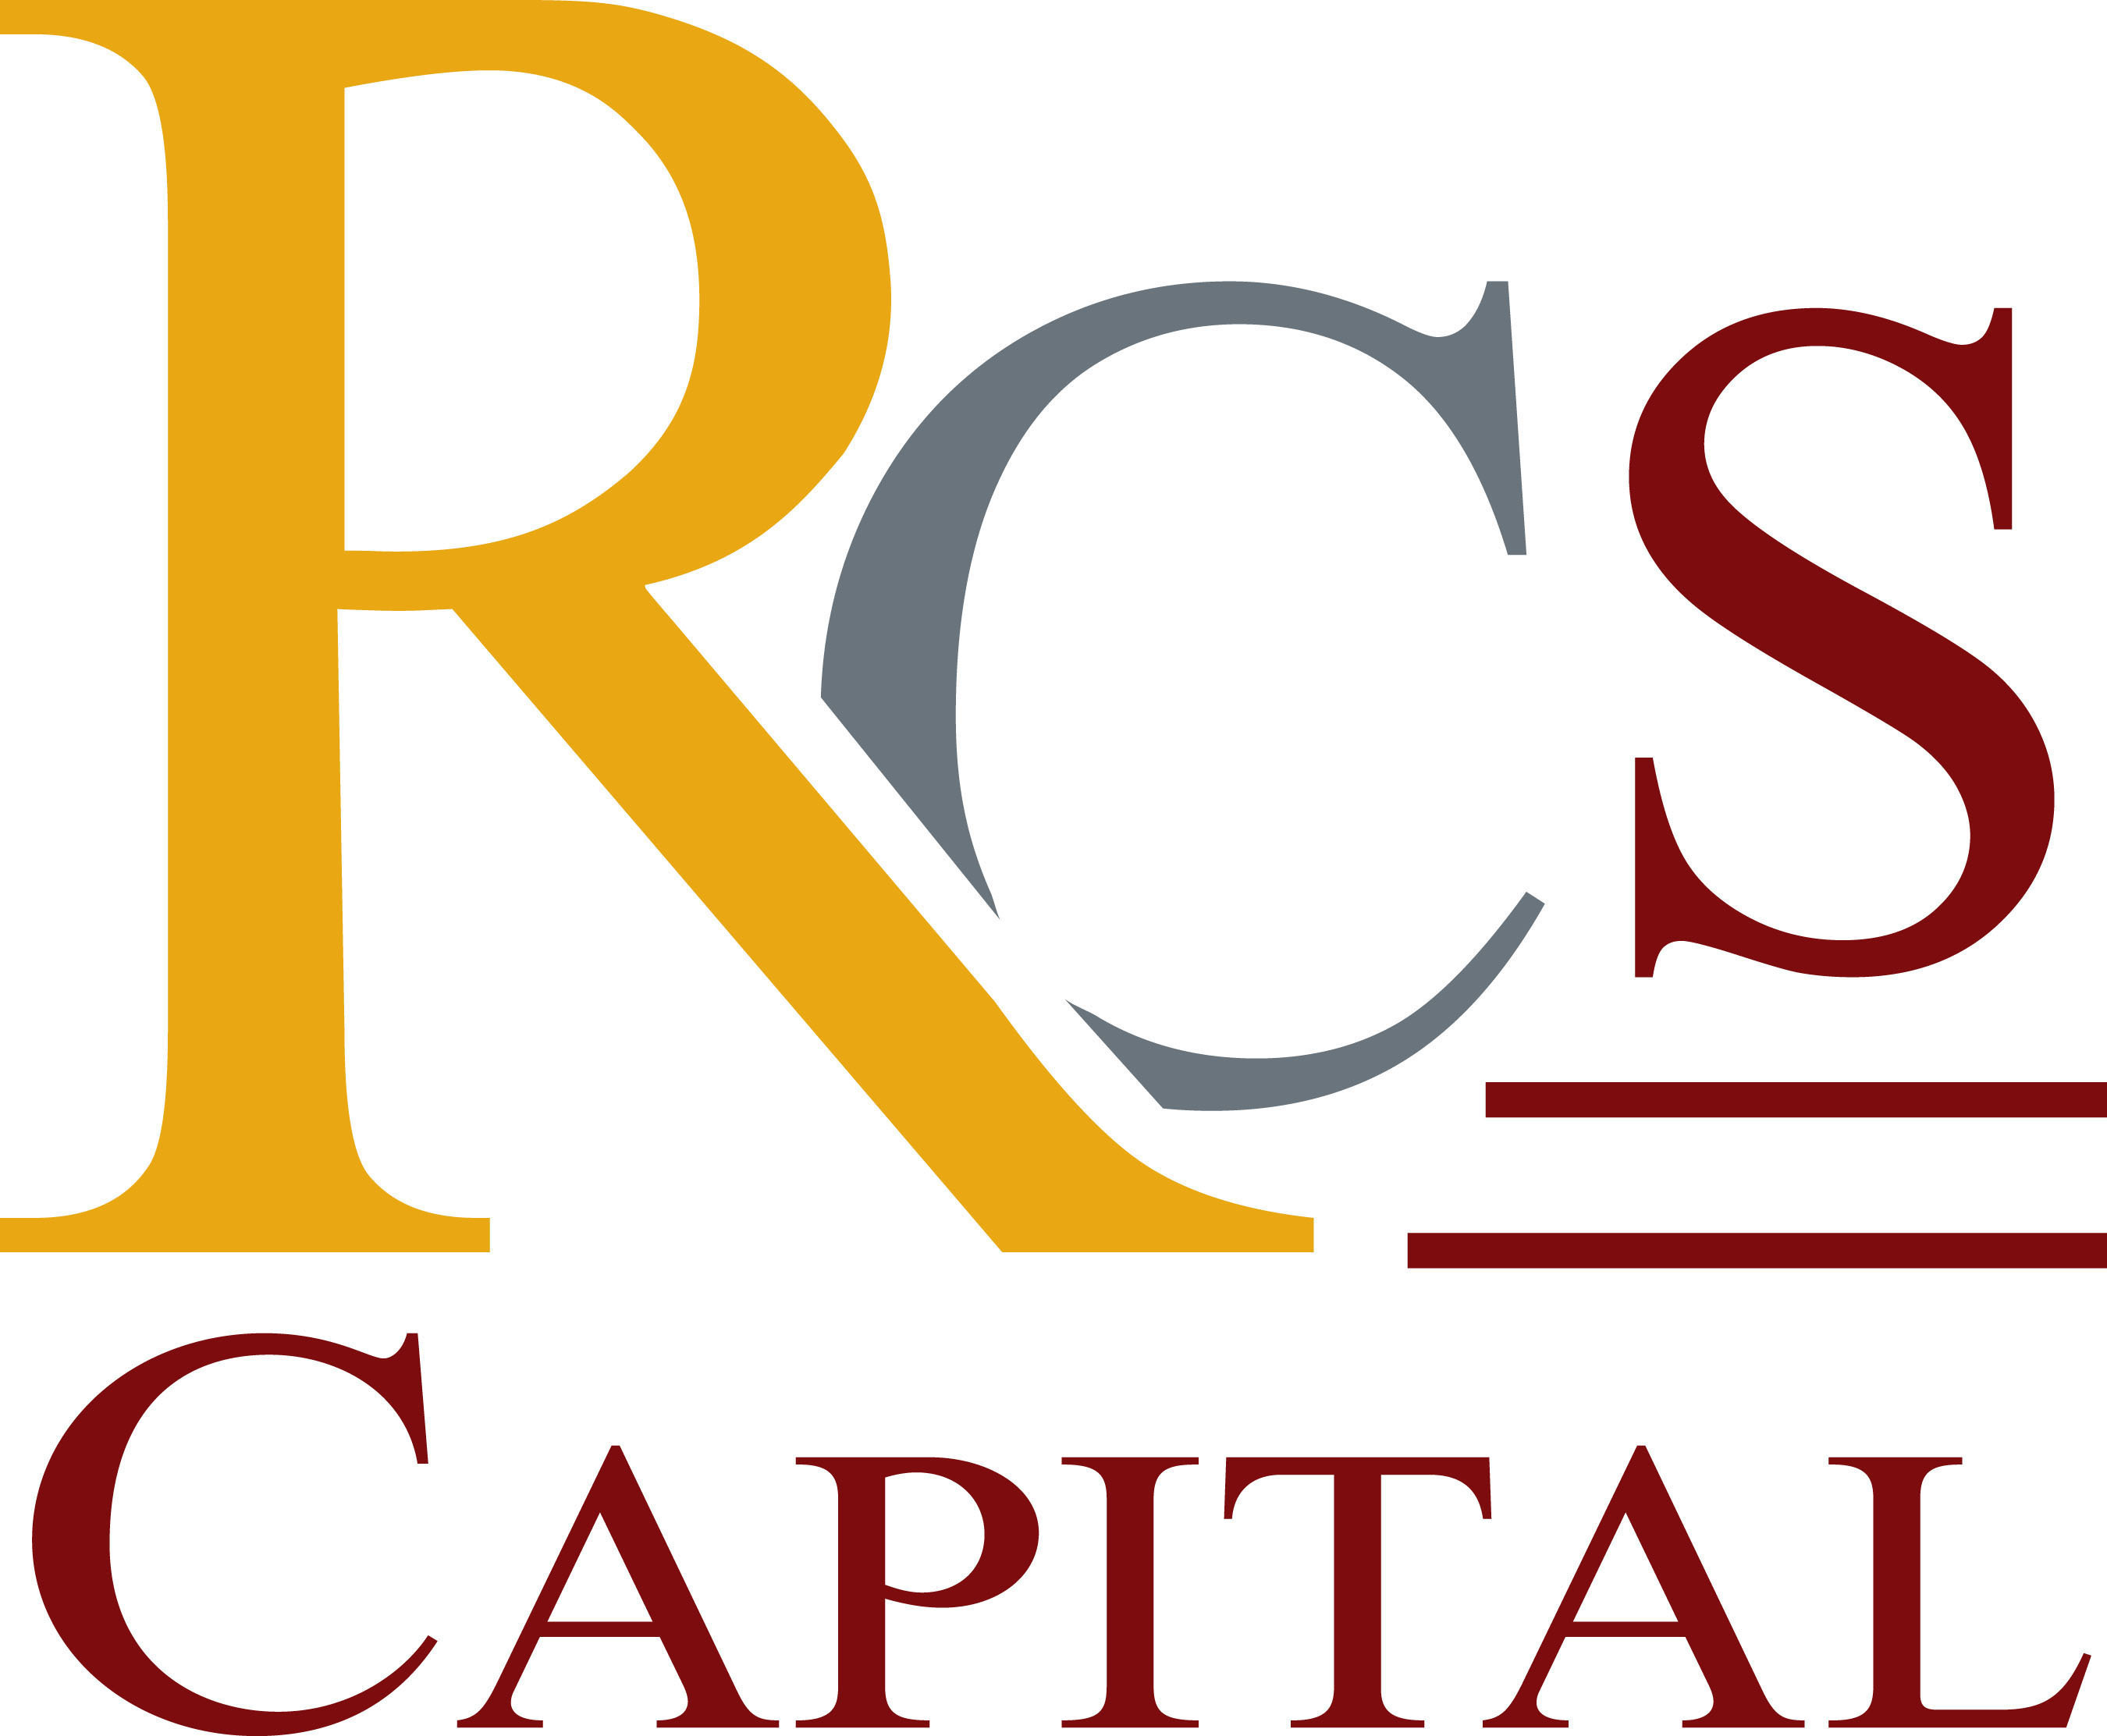 RCS Capital Corporation, Inc. (PRNewsFoto/RCS Capital Corporation, Inc.) (PRNewsFoto/)